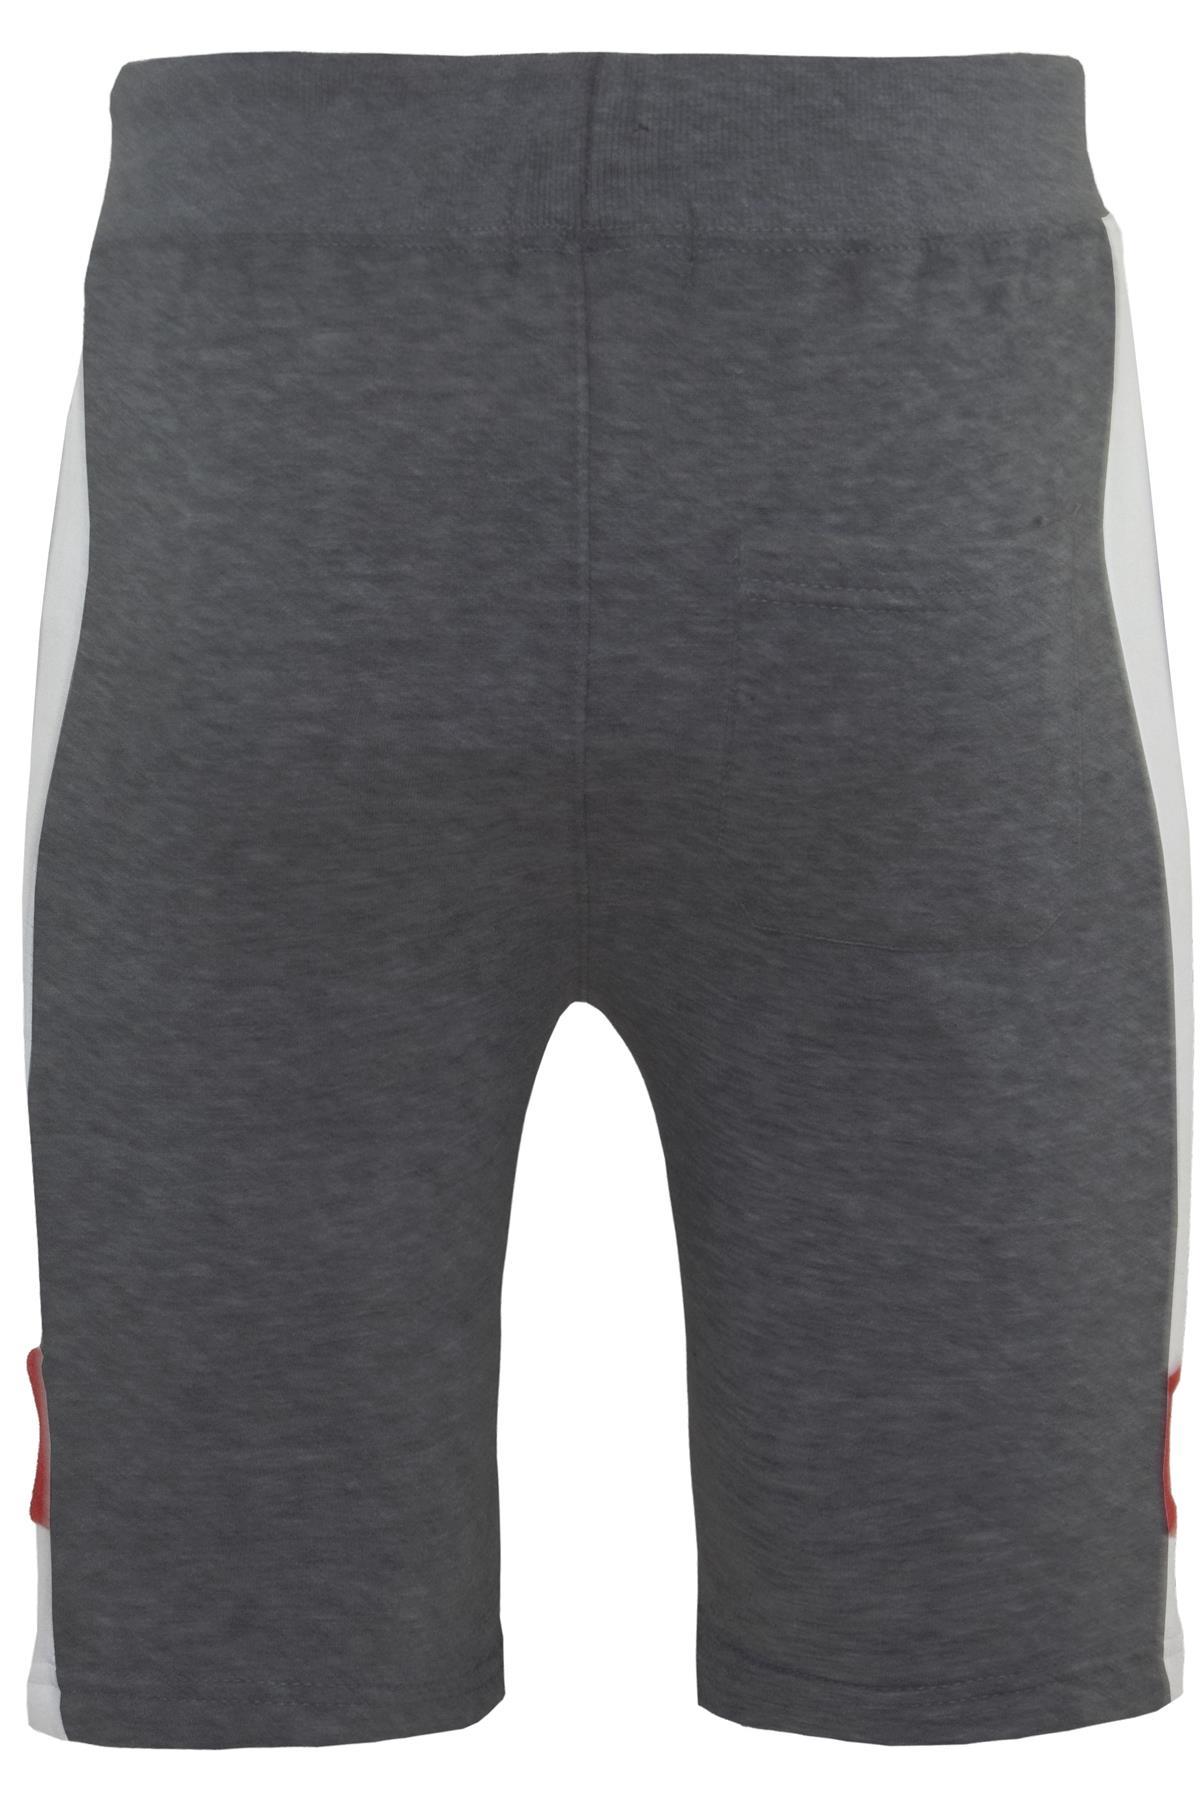 Mens-Contrast-Panel-Running-Summer-Side-Slit-Knee-Length-Fleece-Bottoms-Shorts thumbnail 13